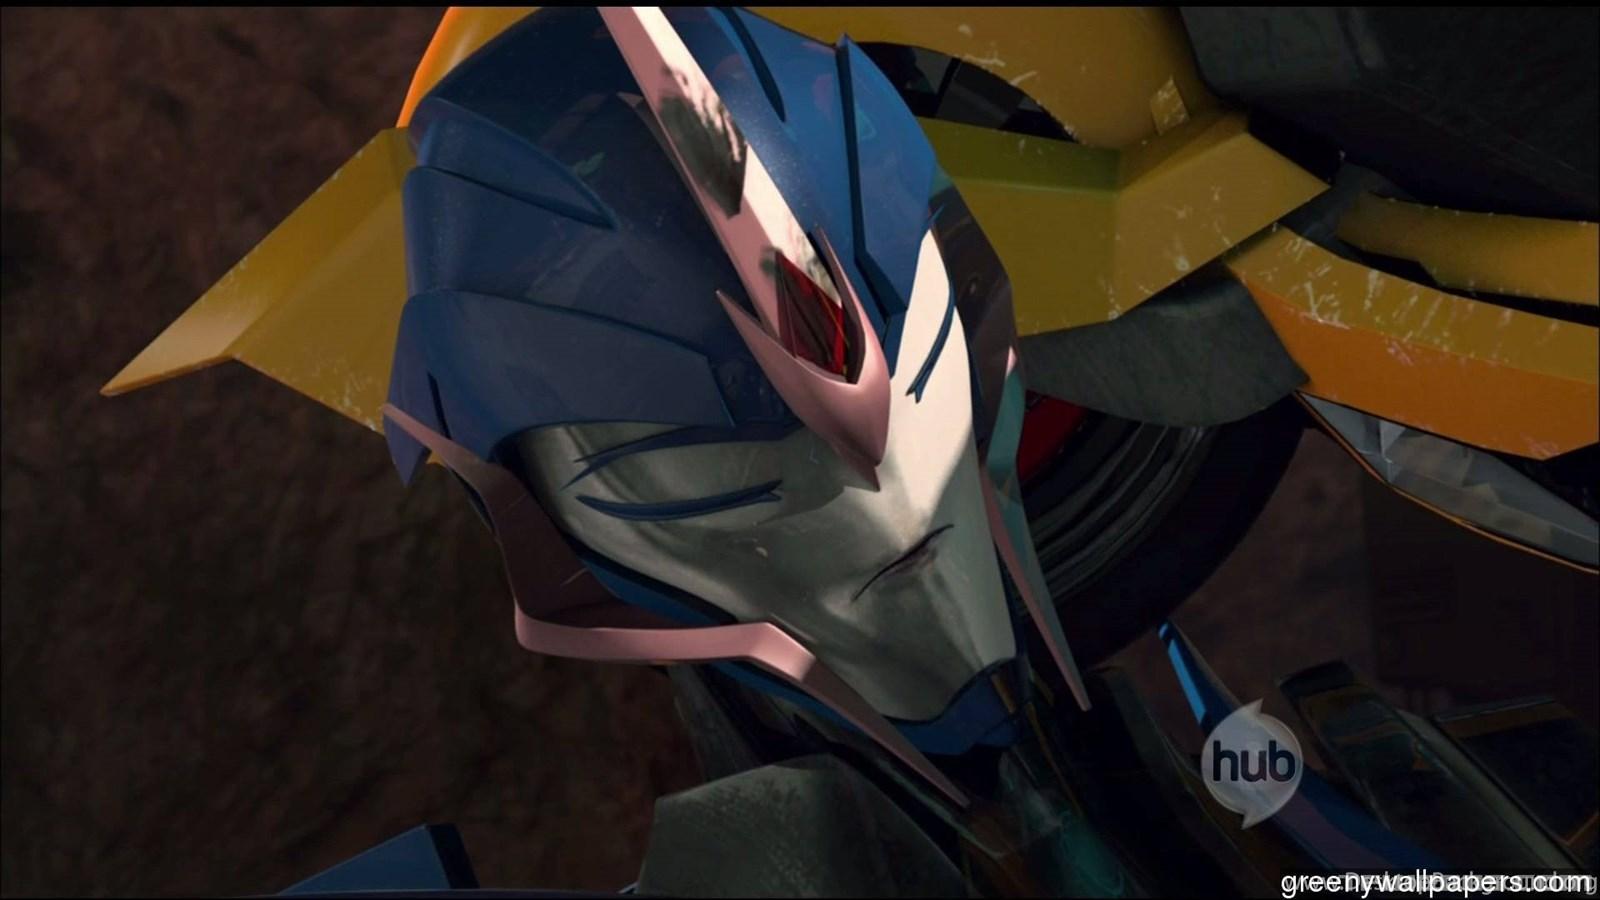 Transformers prime full episodes in hindi download criseedit.